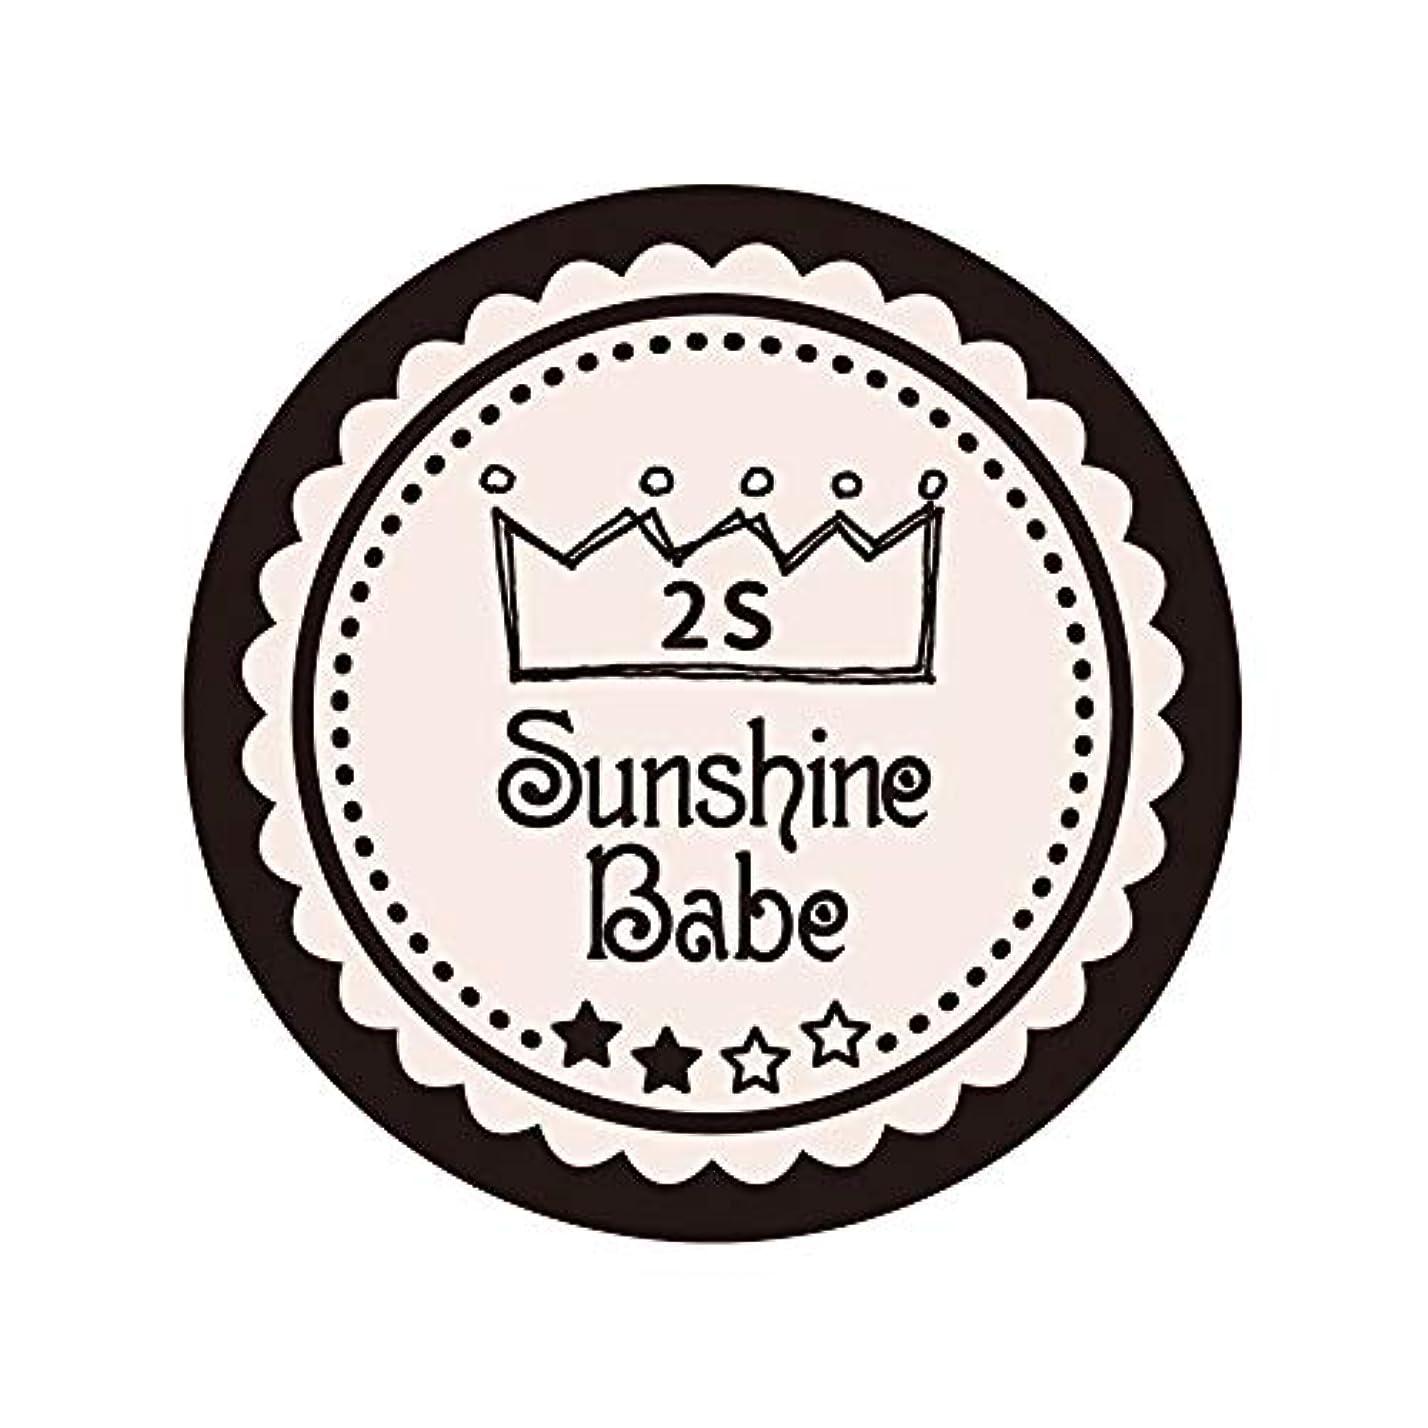 Sunshine Babe カラージェル 2S オールモーストモーブ 2.7g UV/LED対応